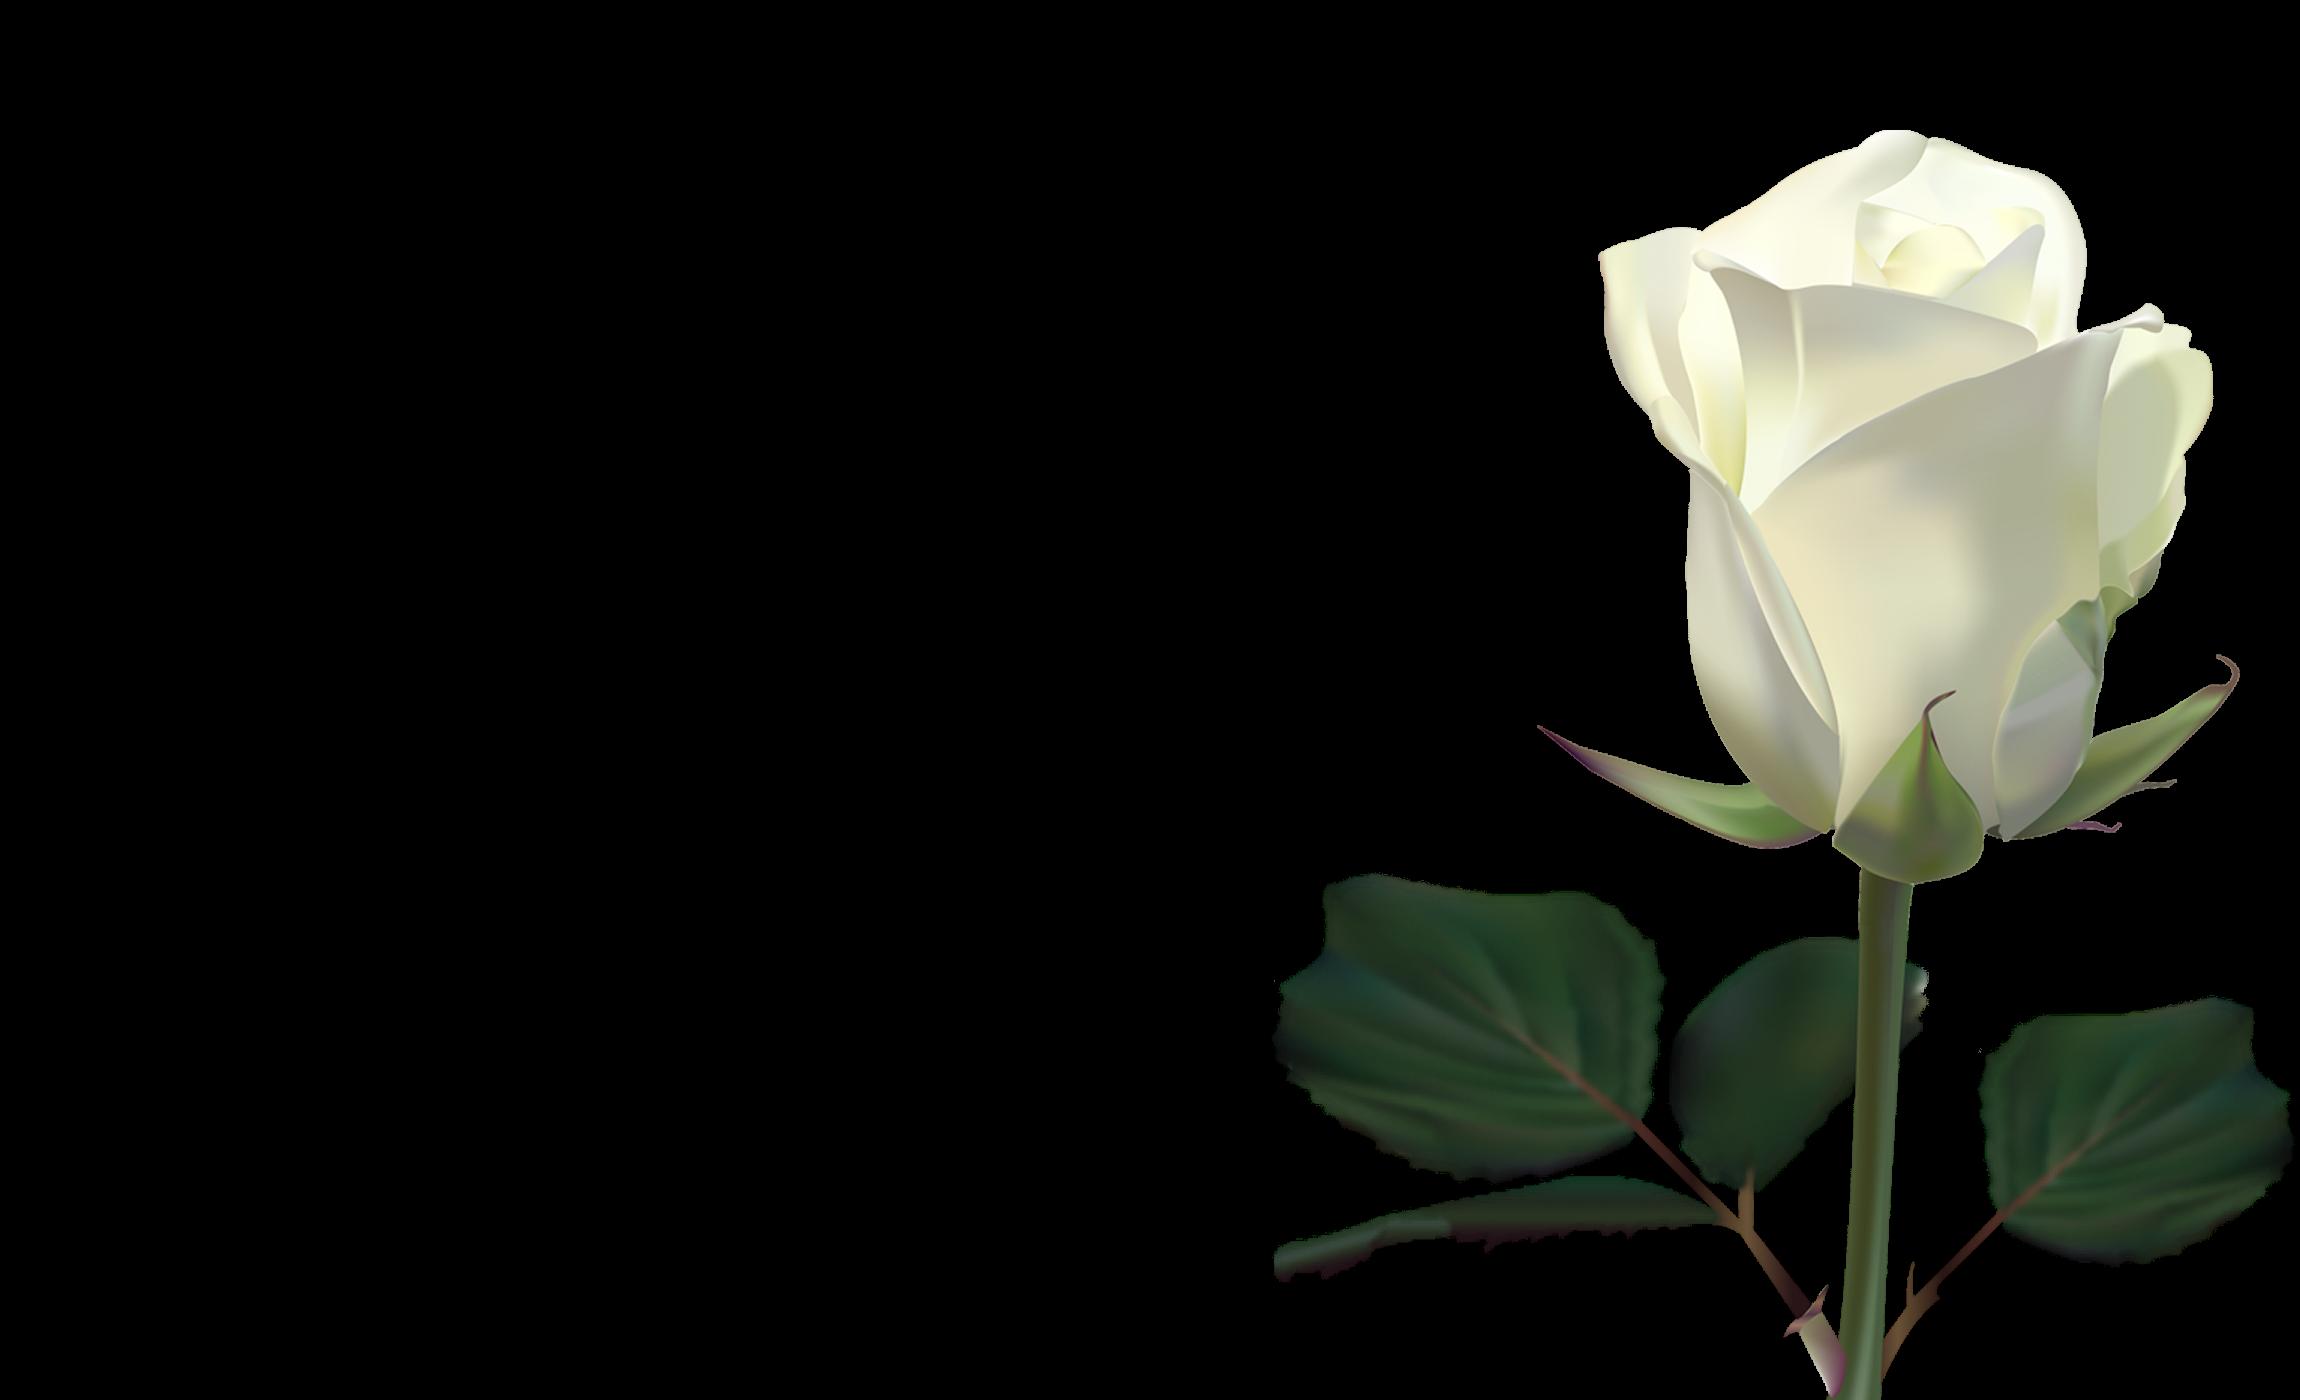 white rose wallpaper by lilianneret on deviantart